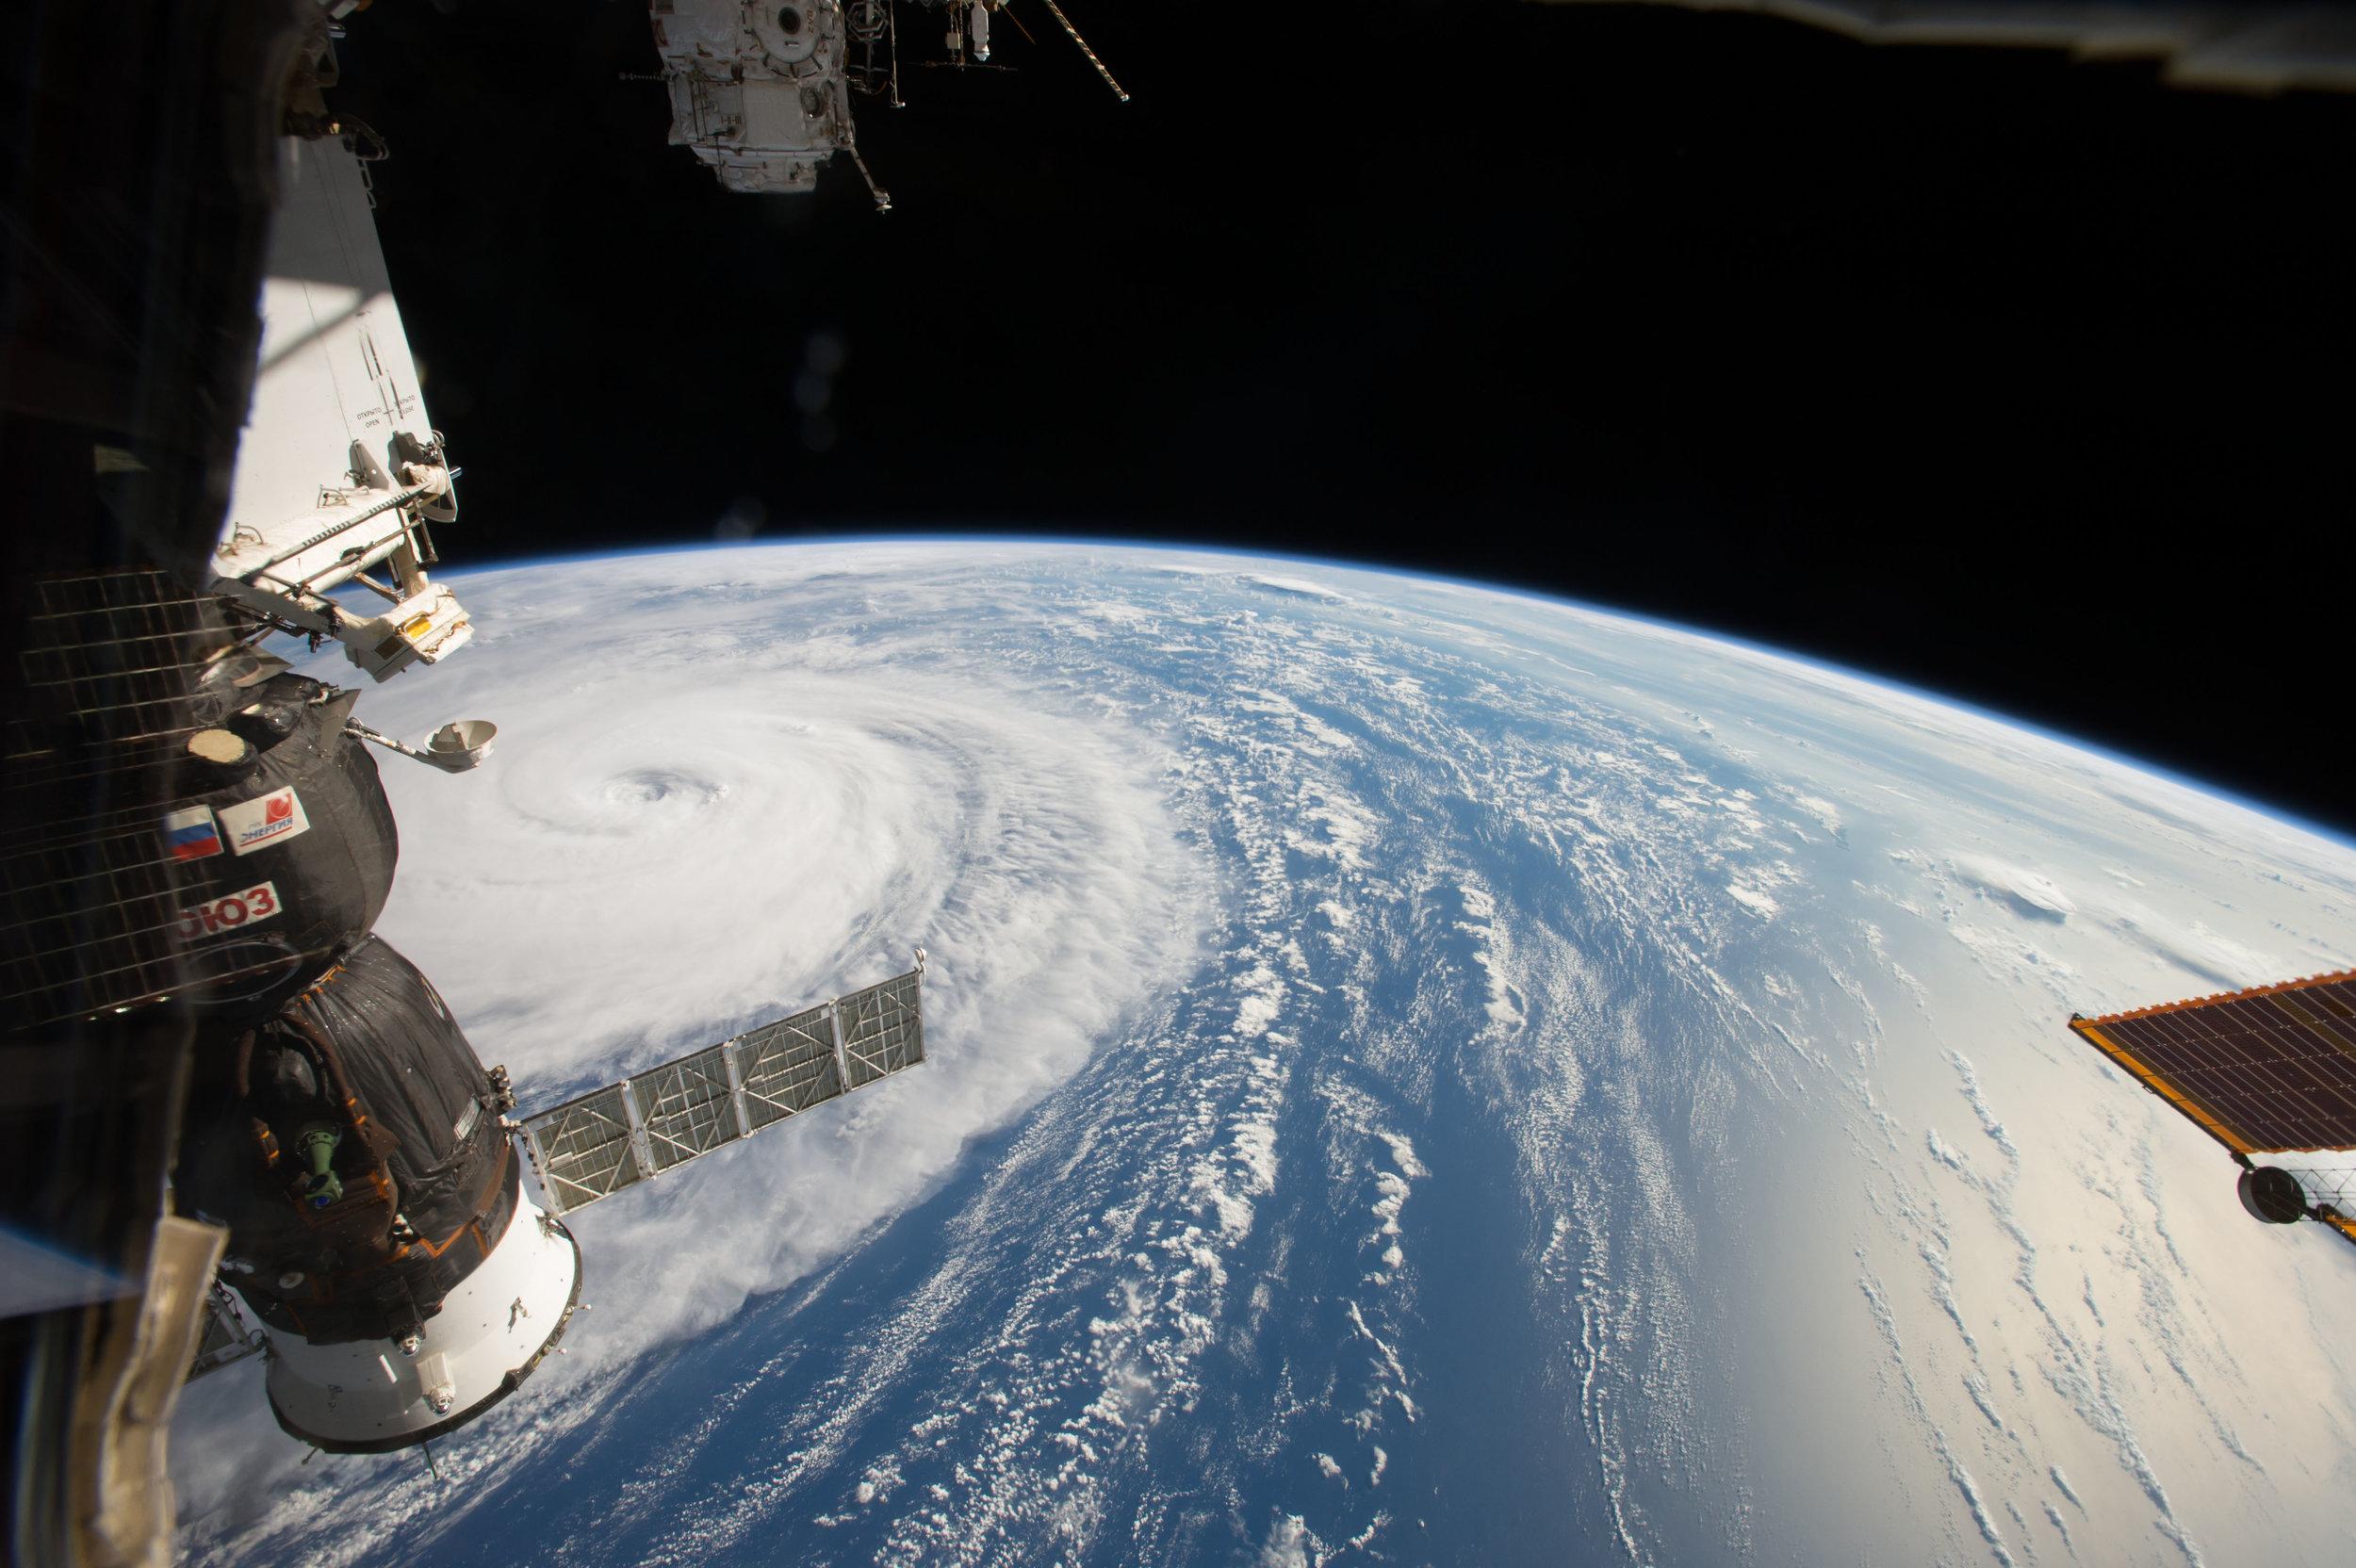 Super Typhoon Noru as seen from the International Space Station Aug. 1, 2017. Photo Credit: Randy Bresnik / NASA